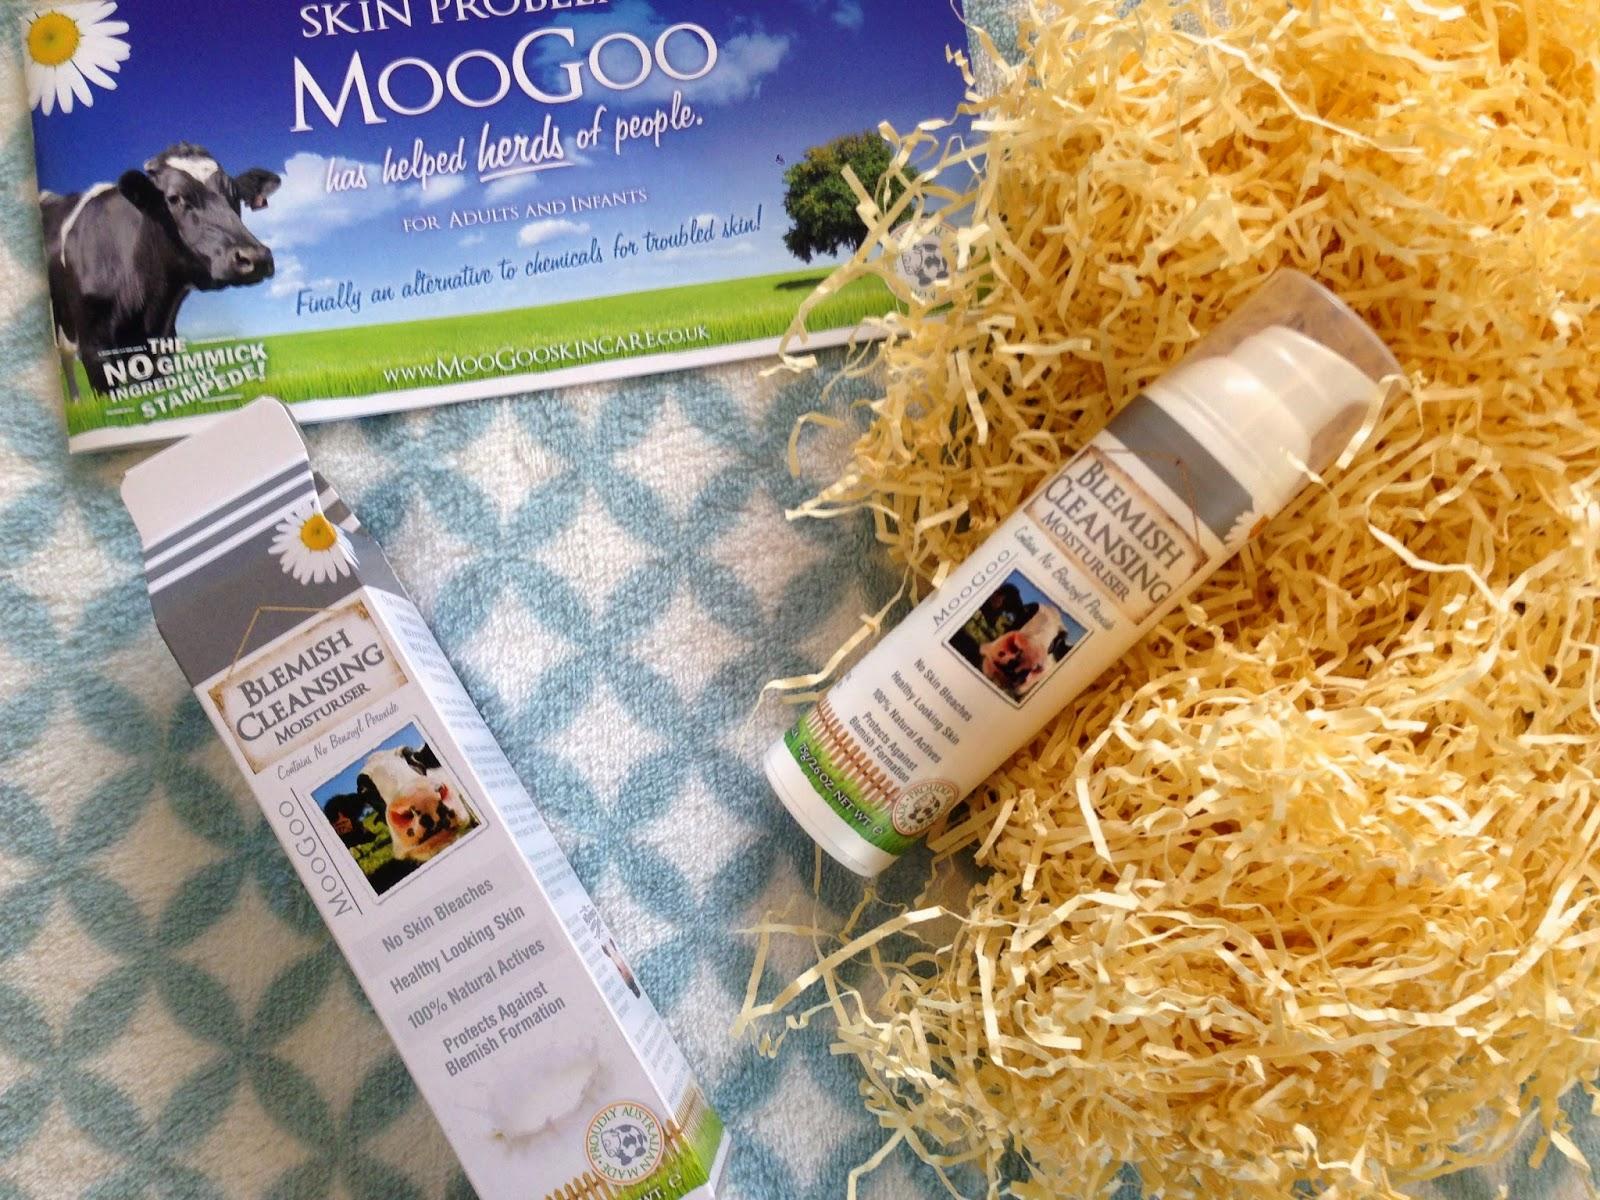 MooGoo Natural Chemical Free Blemish Cleansing Moisturiser Review